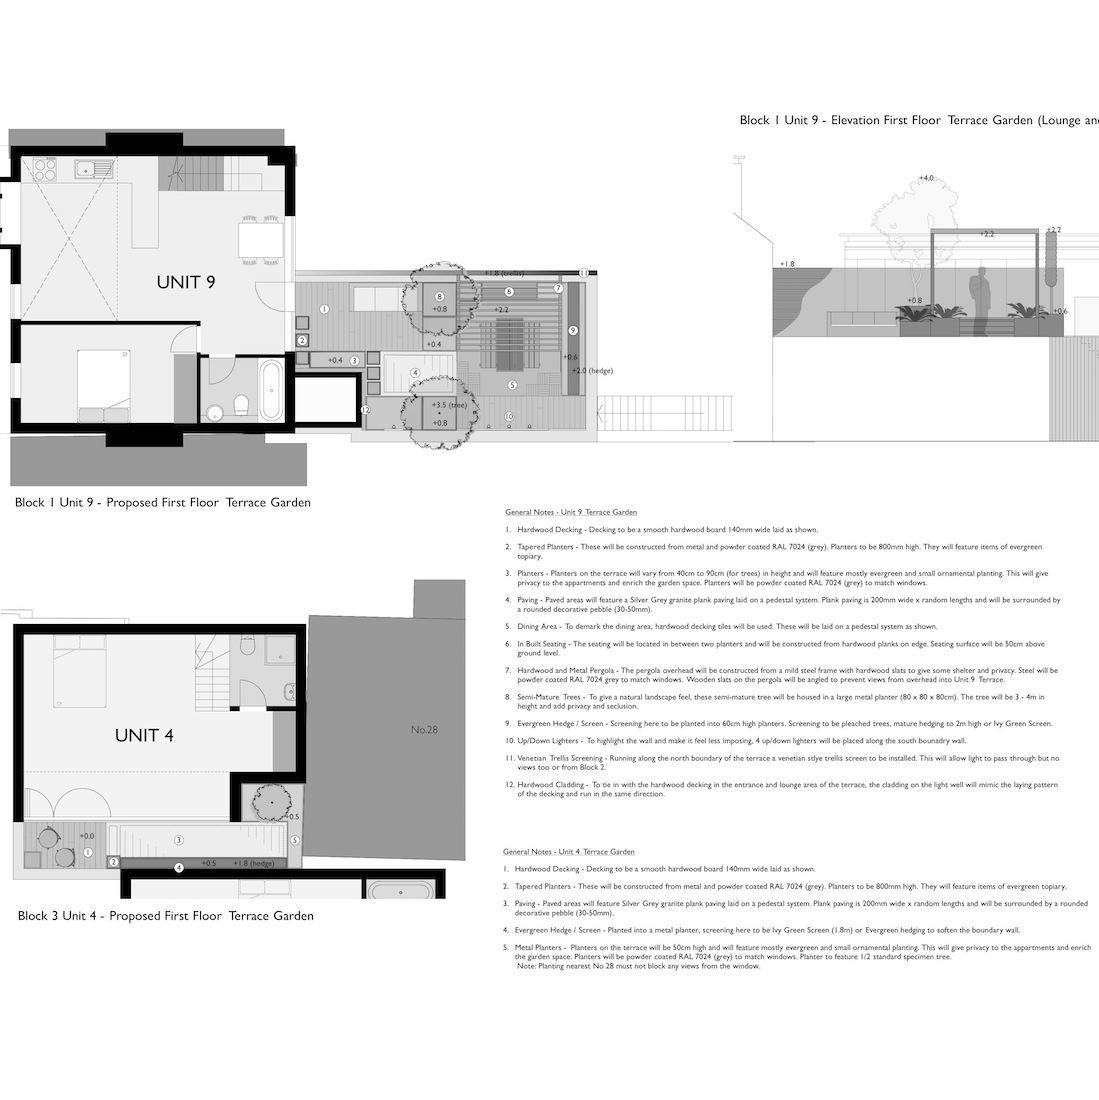 Tristen Knight Garden Design Napier Street Proposed Landscape Plans image 2